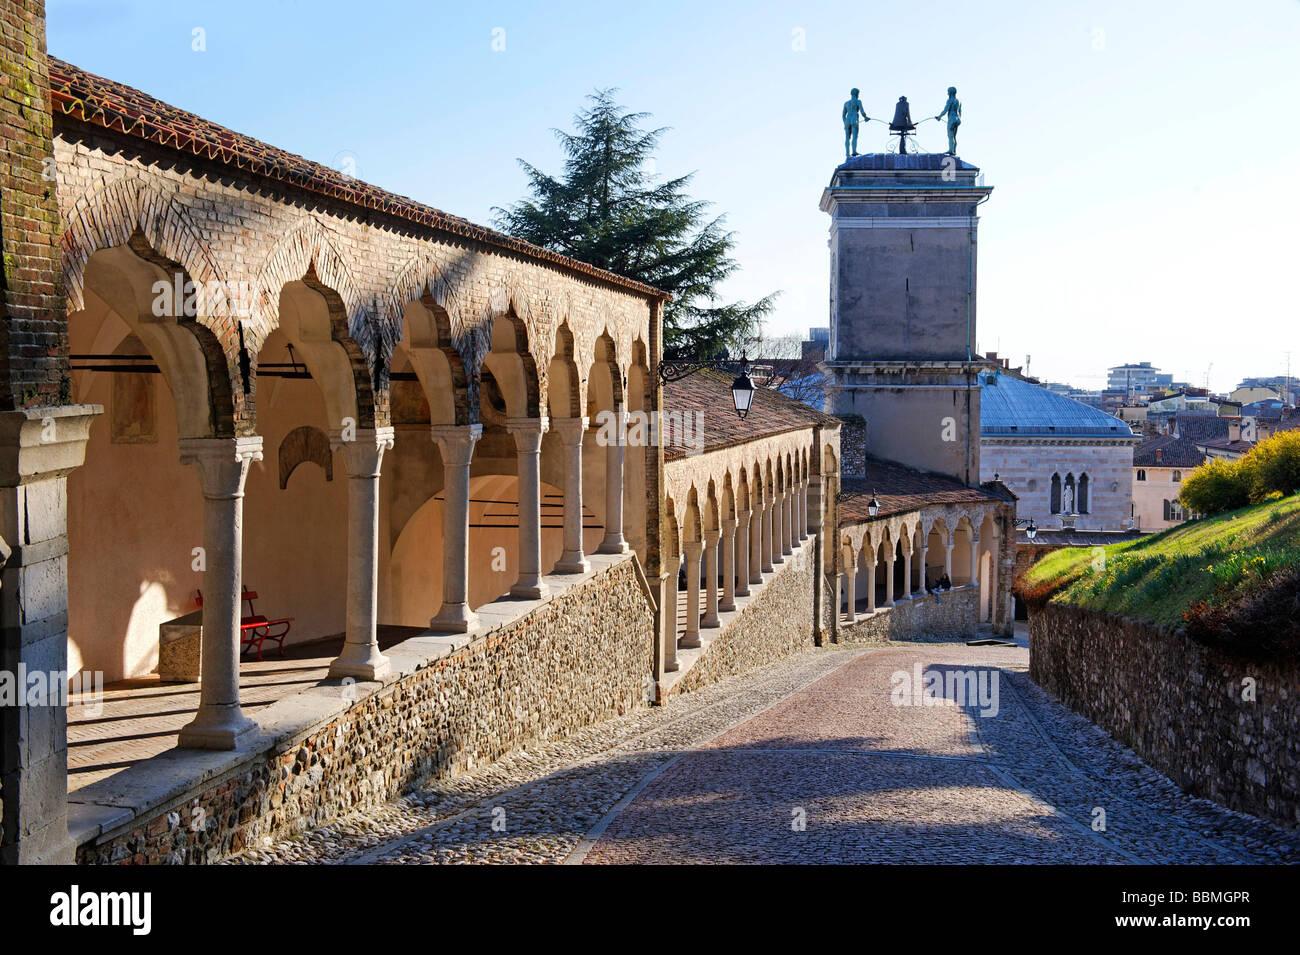 Way to the Castello from the Piazza Liberta, Udine, Friuli-Venezia Giulia, Italy, Europe - Stock Image